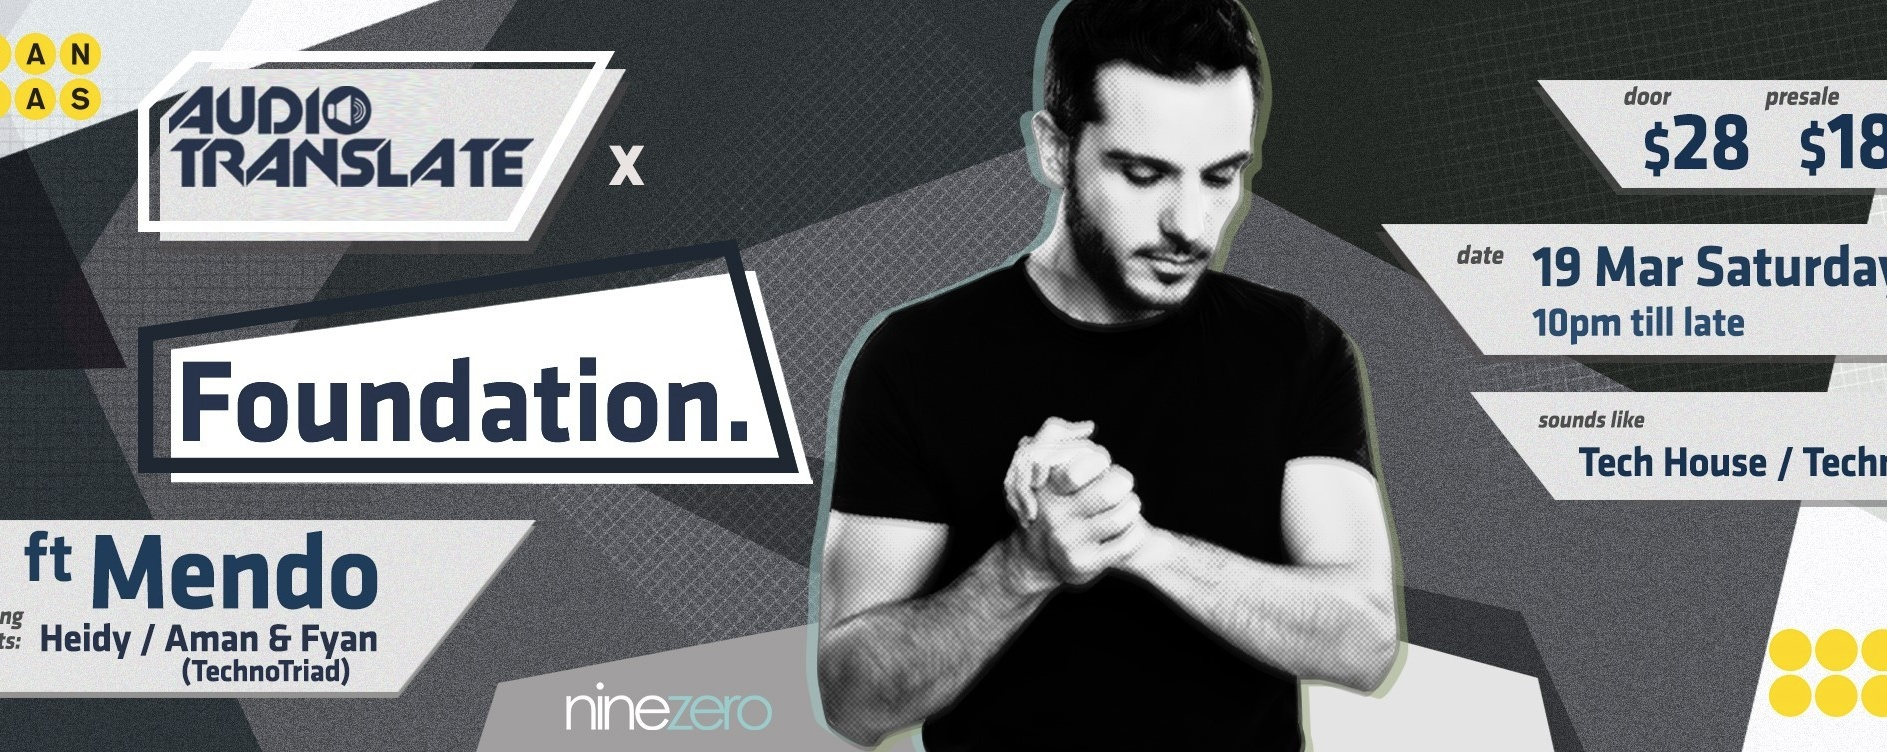 Audio Translate x Foundation. ft. Mendo